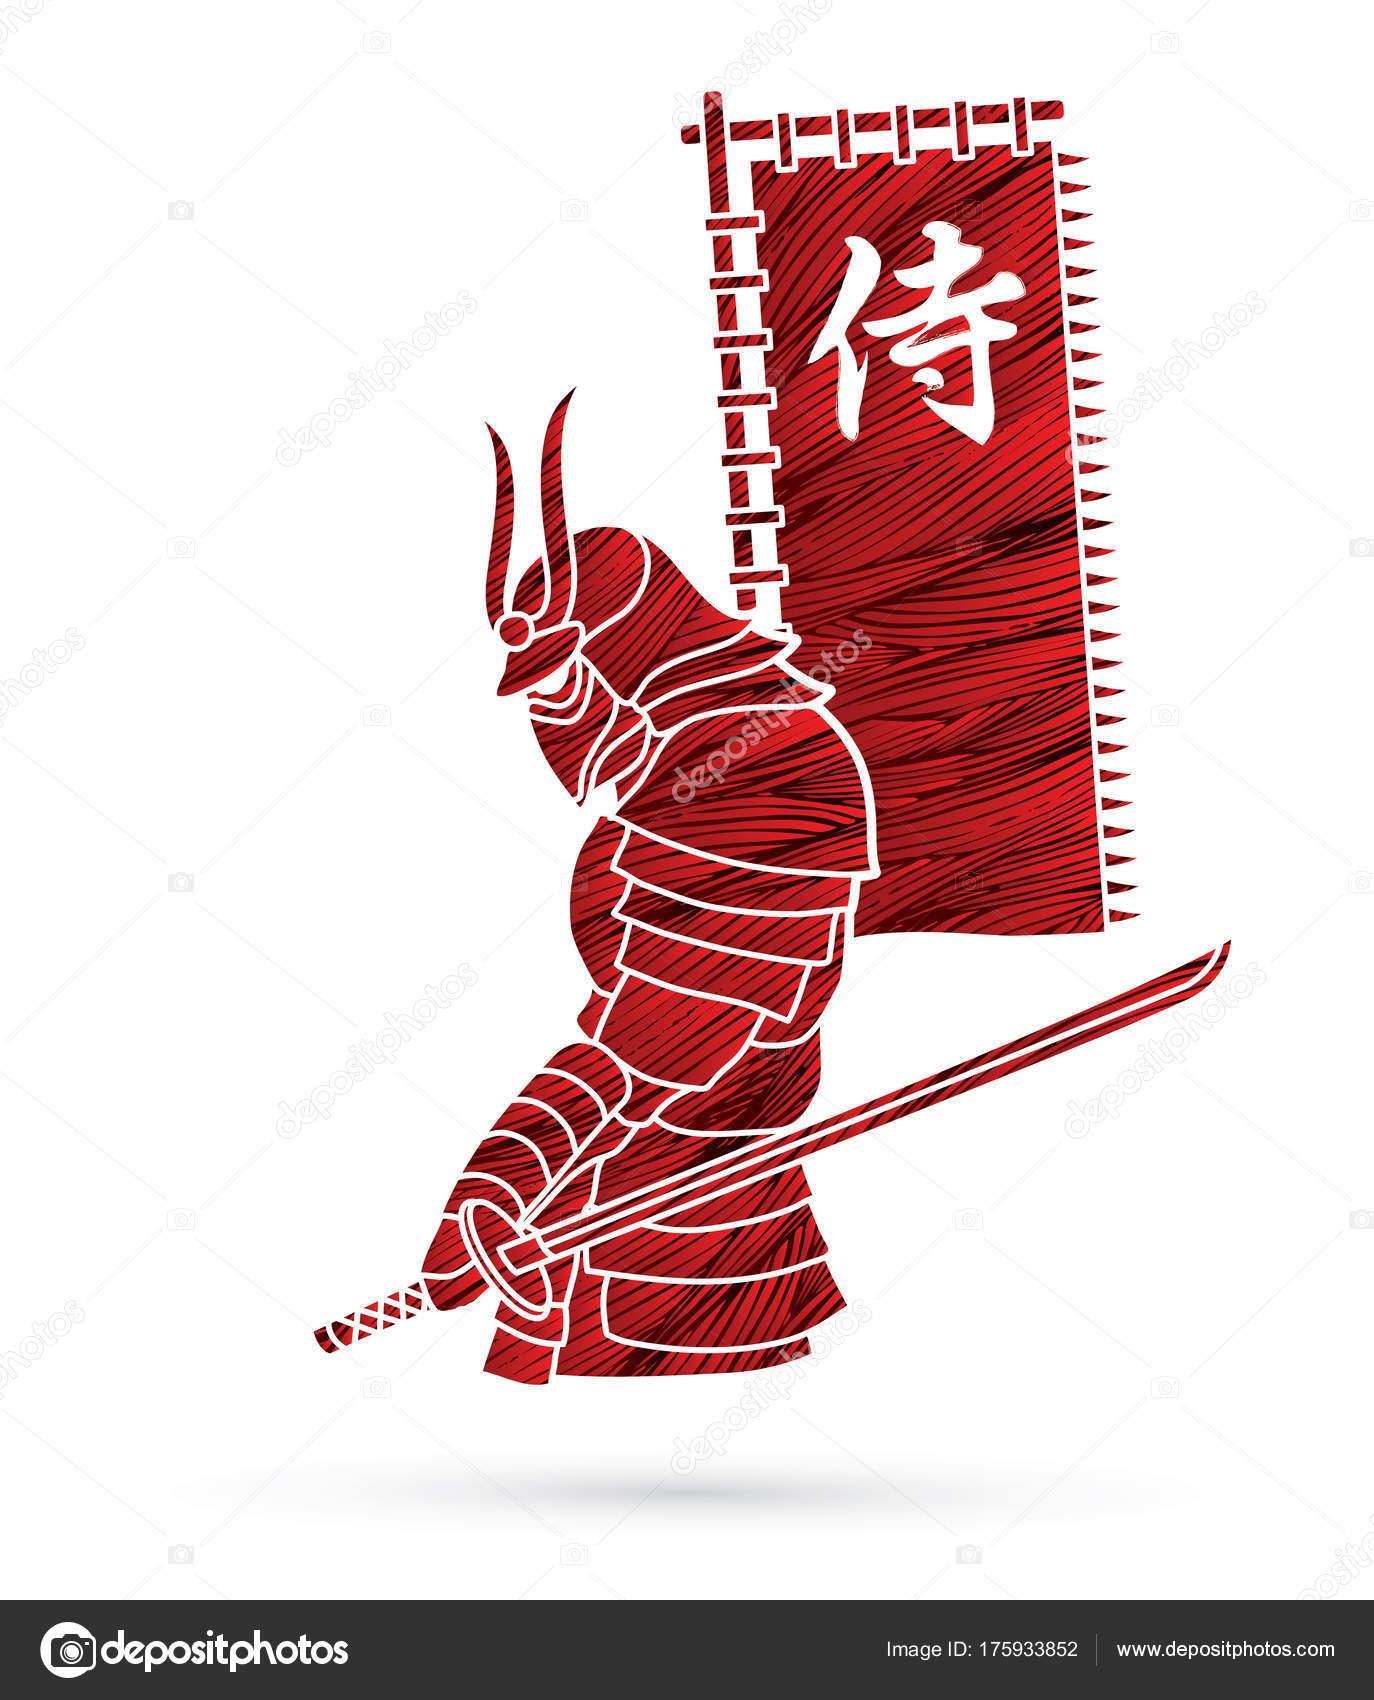 XXX βίντεο Ιαπωνικά com